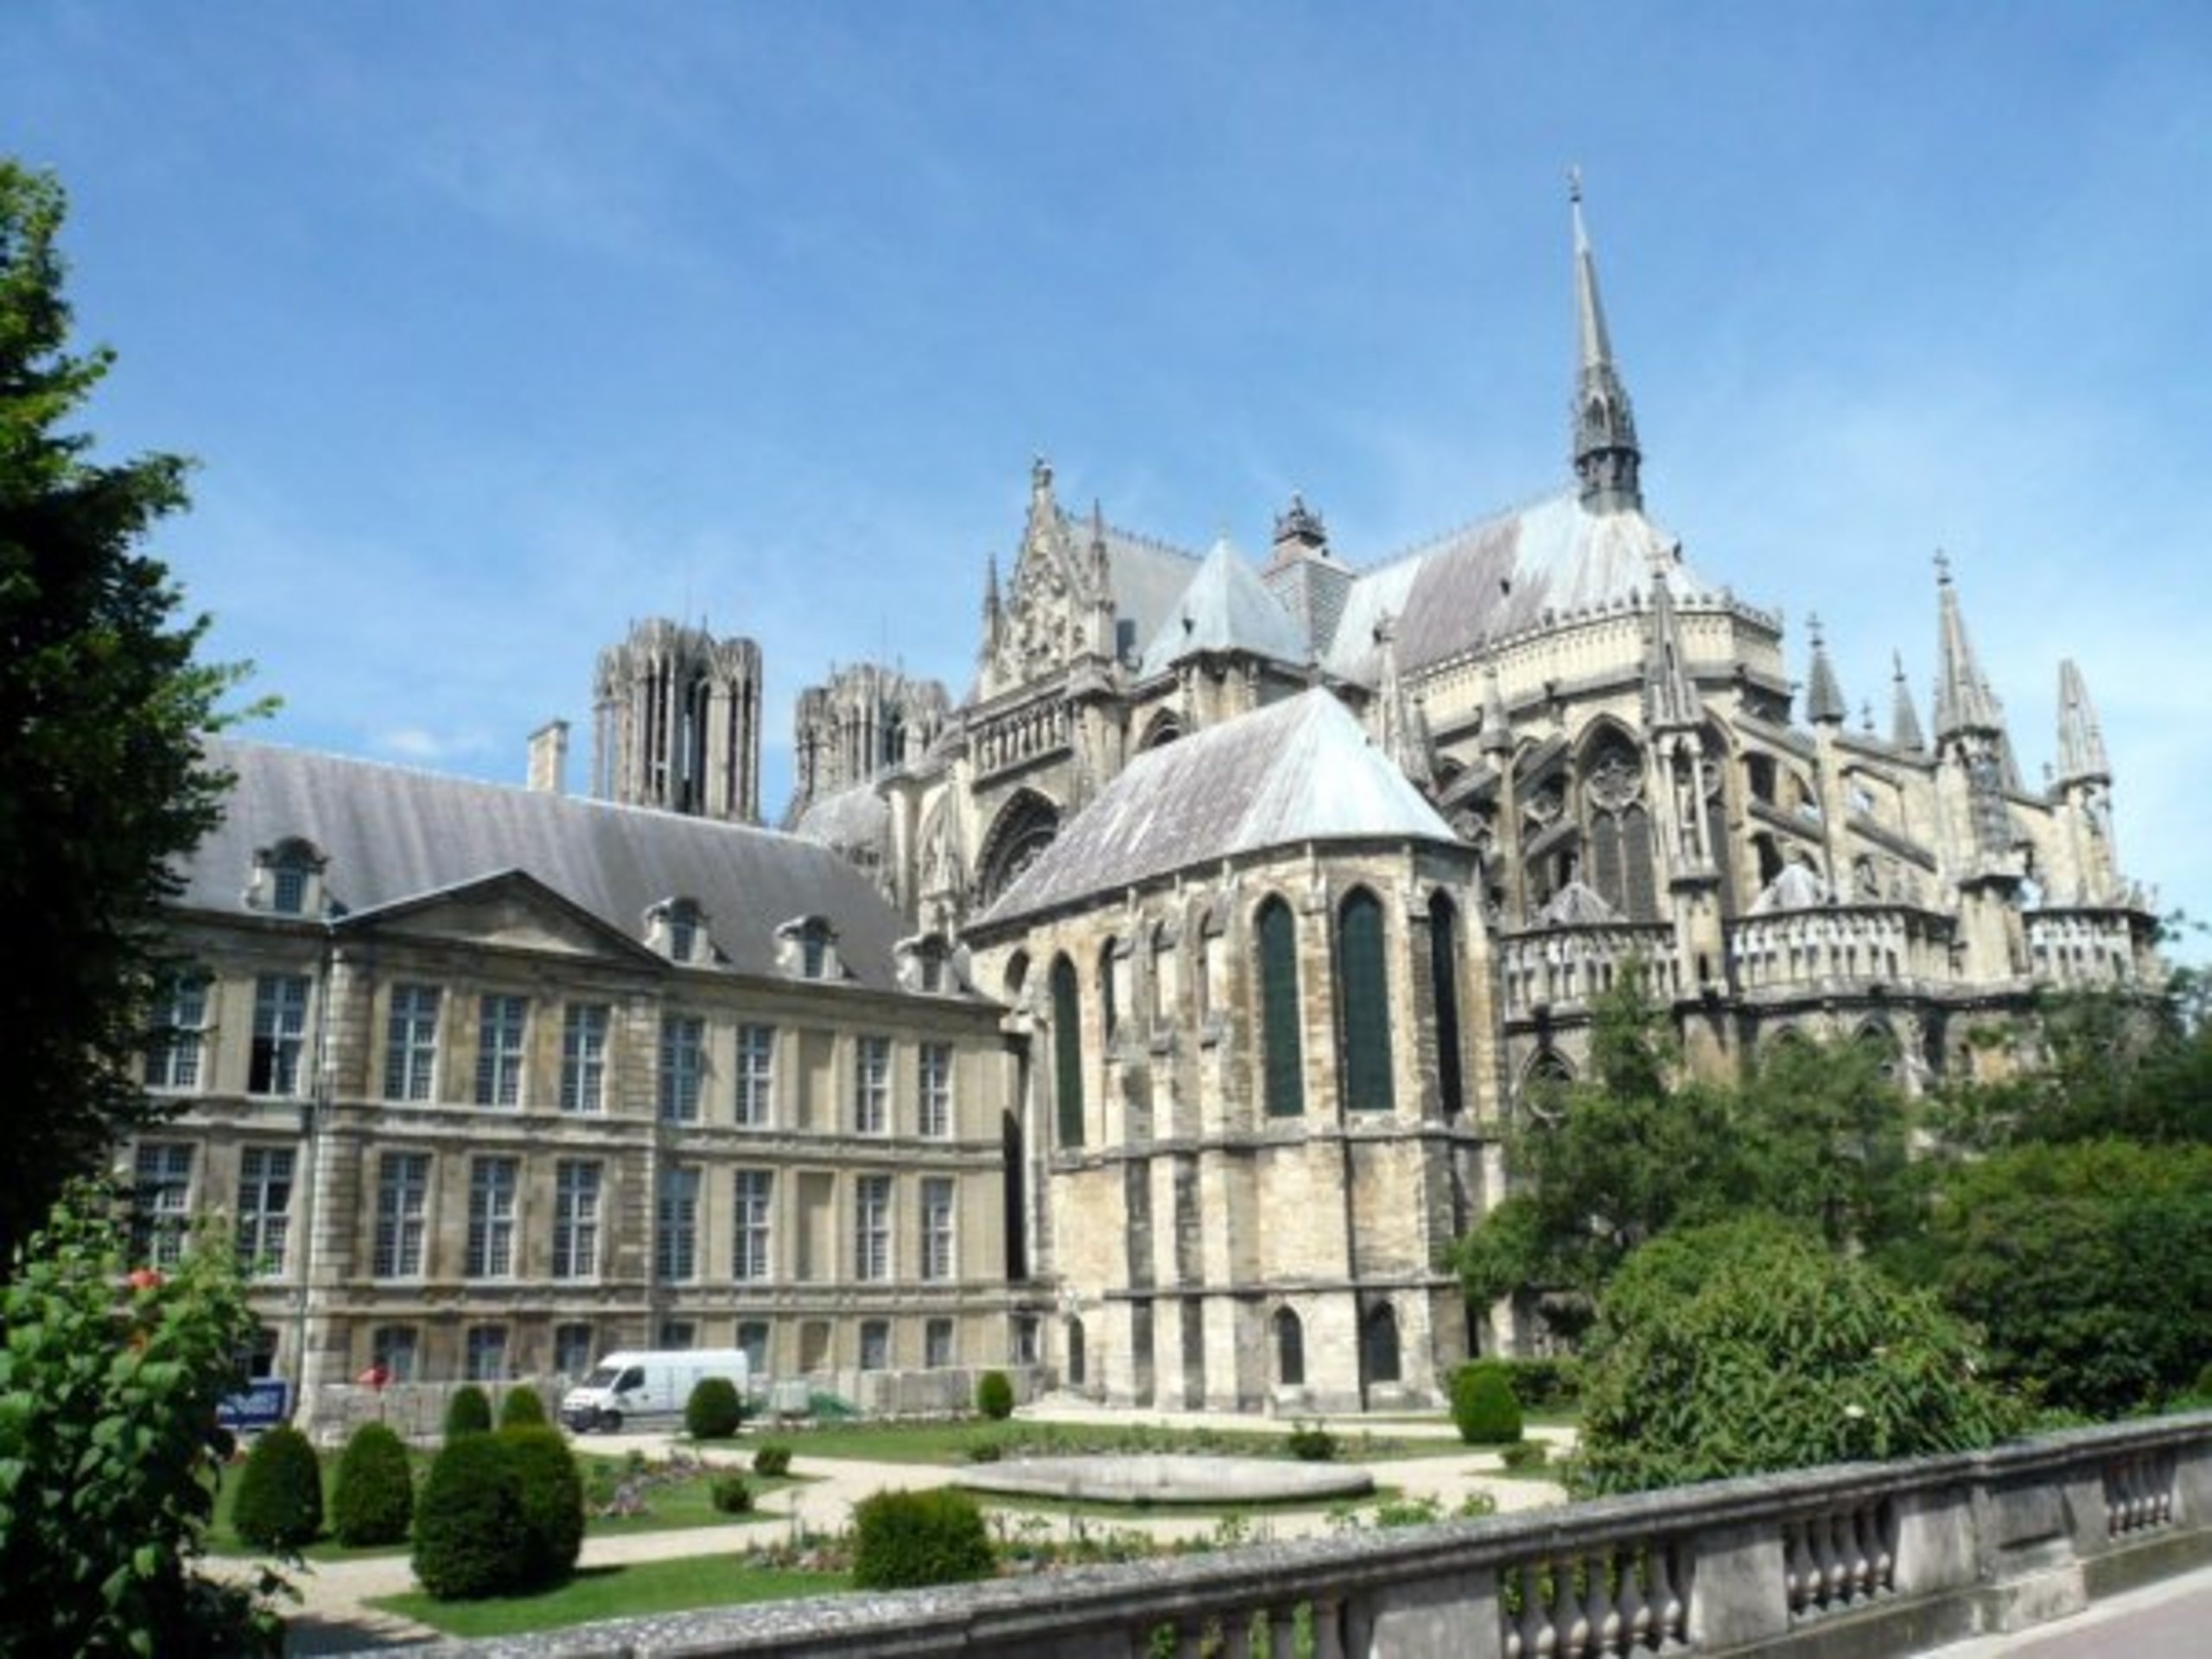 Reims 2019: Best of Reims, France Tourism - TripAdvisor